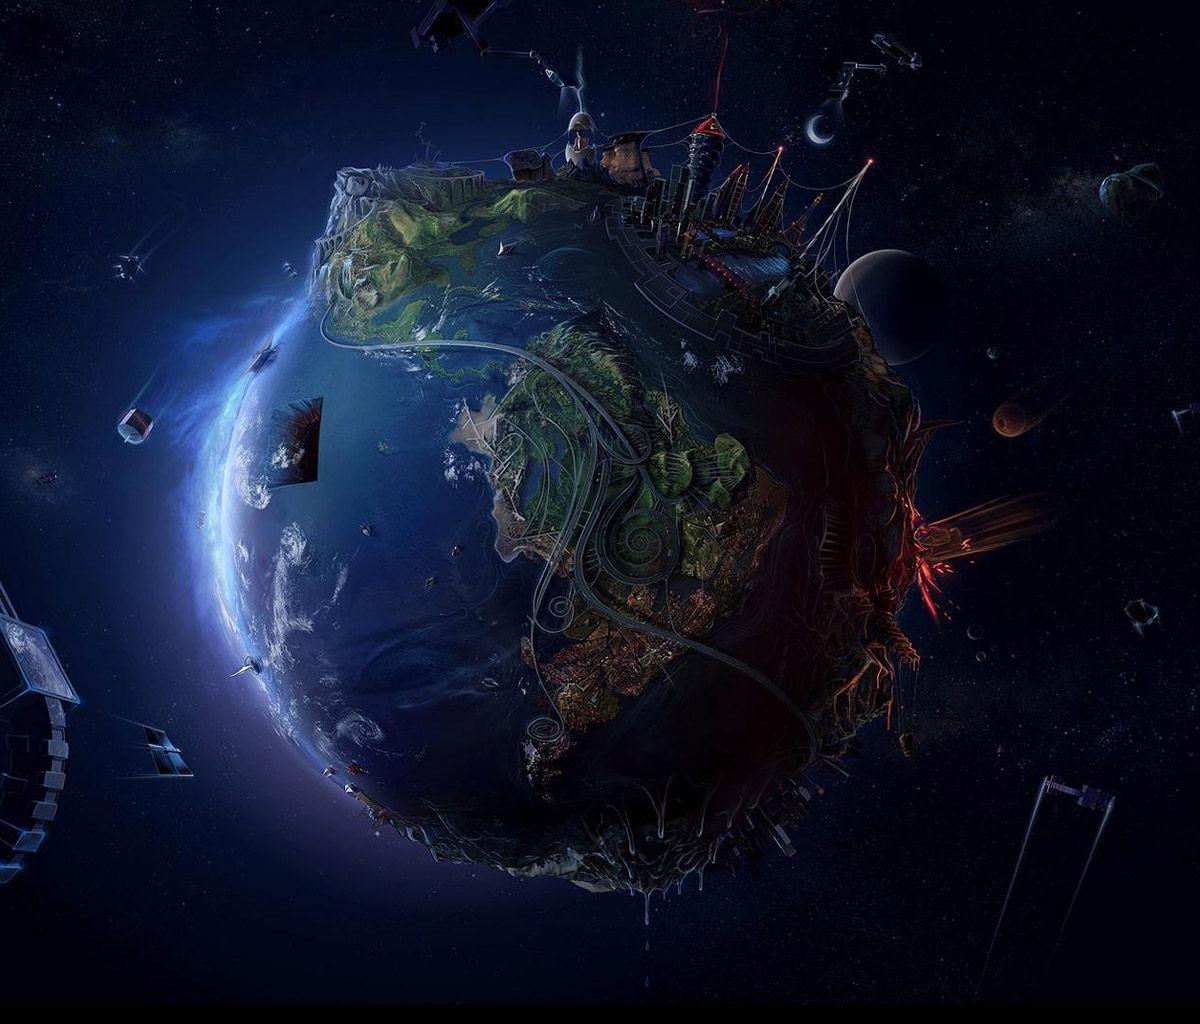 Pin by Daniel James Soto on Stellar in 2020 Space art